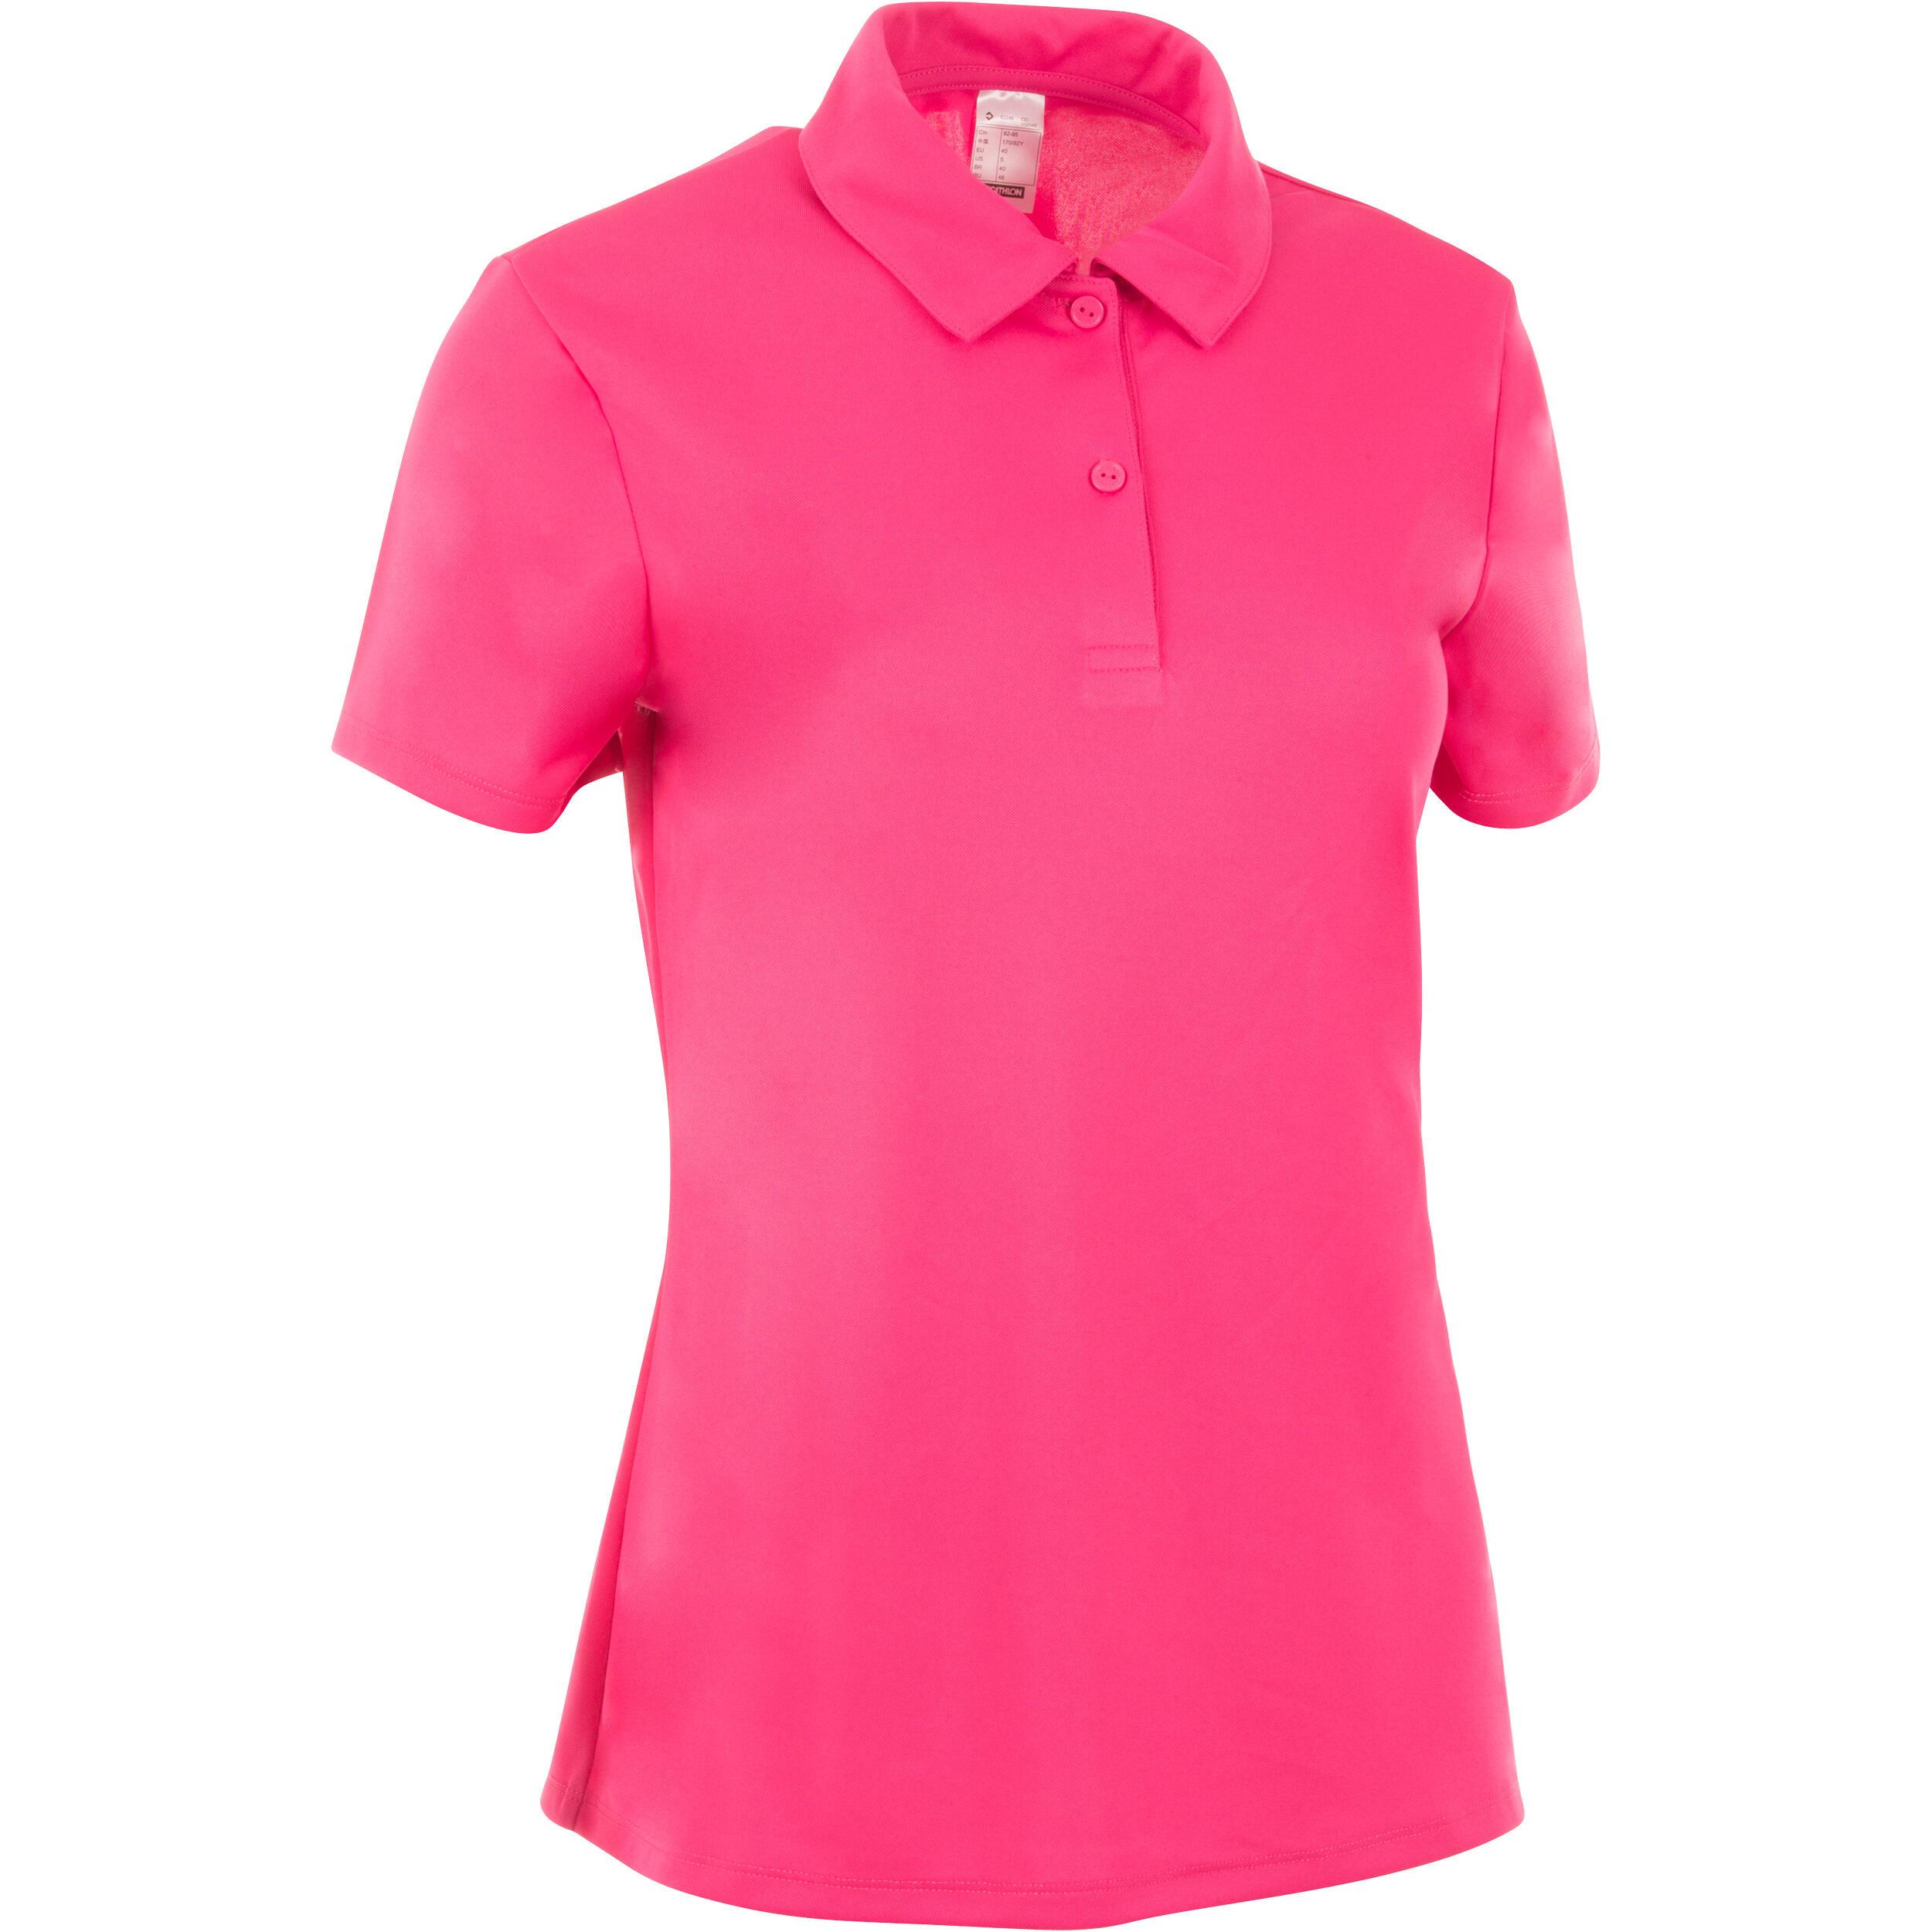 Poloshirt Essentiel 100 Tennis Damen rosa | Bekleidung > Shirts > Poloshirts | Rosa | Artengo